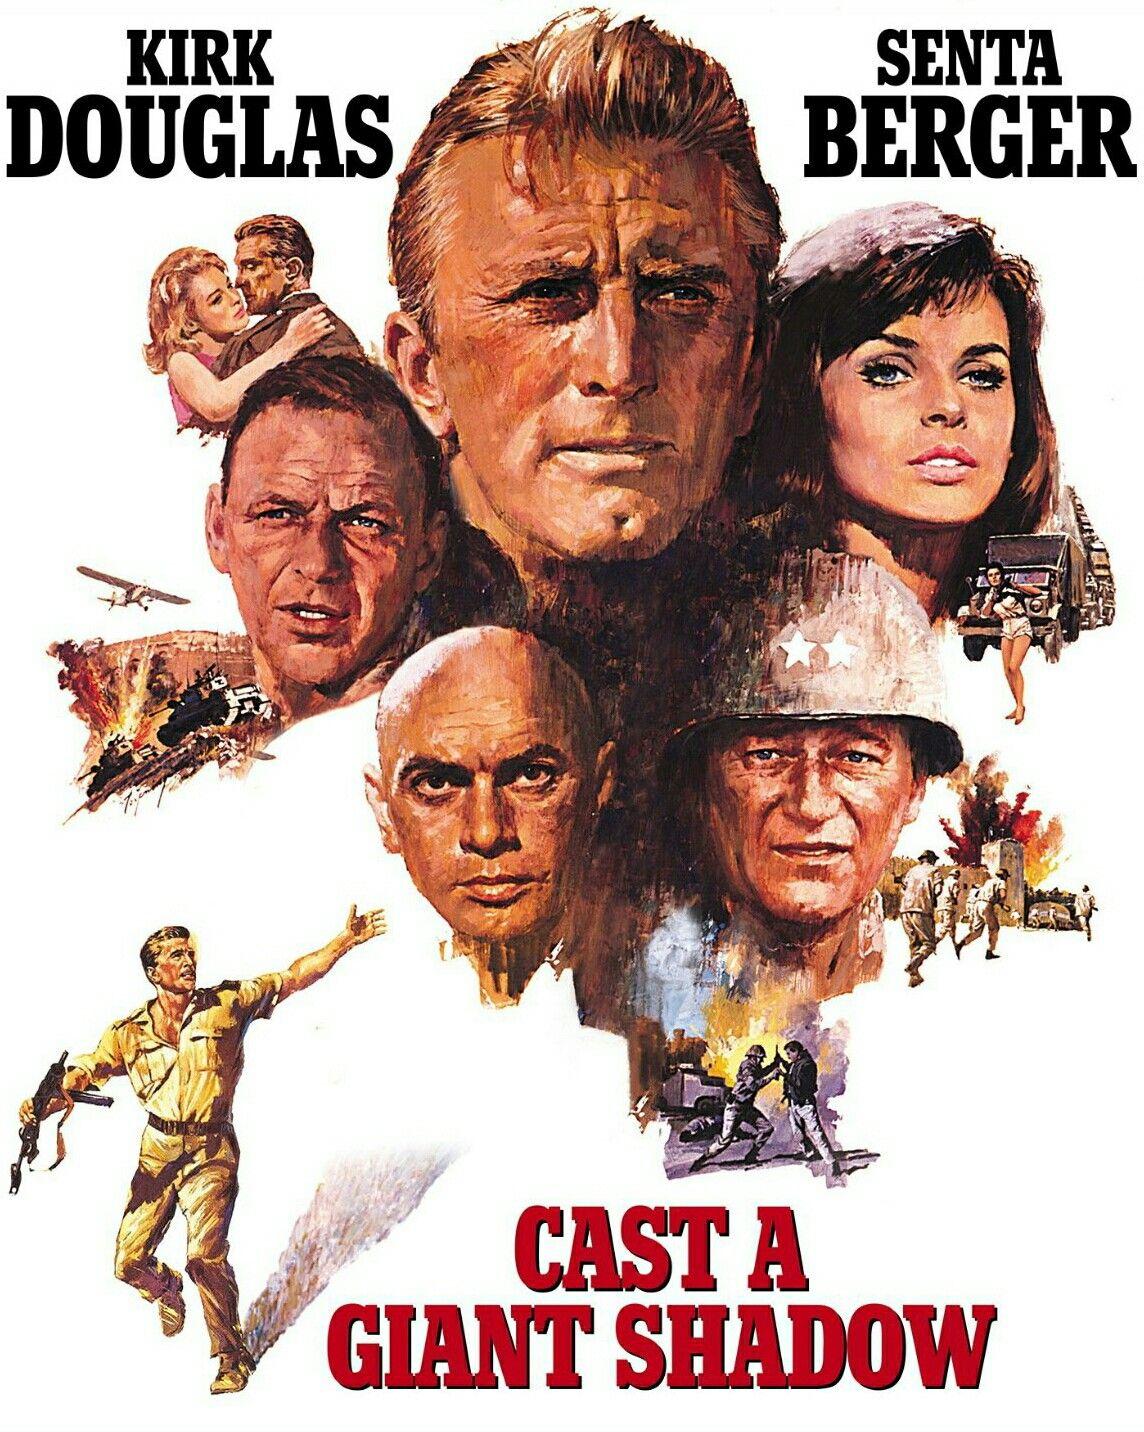 Cast A Giant Shadow 1966 Starring Kirk Douglas Senta Berger Stathis Giallelis James Donald Yul Brynner Fr Cine Bélico Películas Completas Gratis Cine